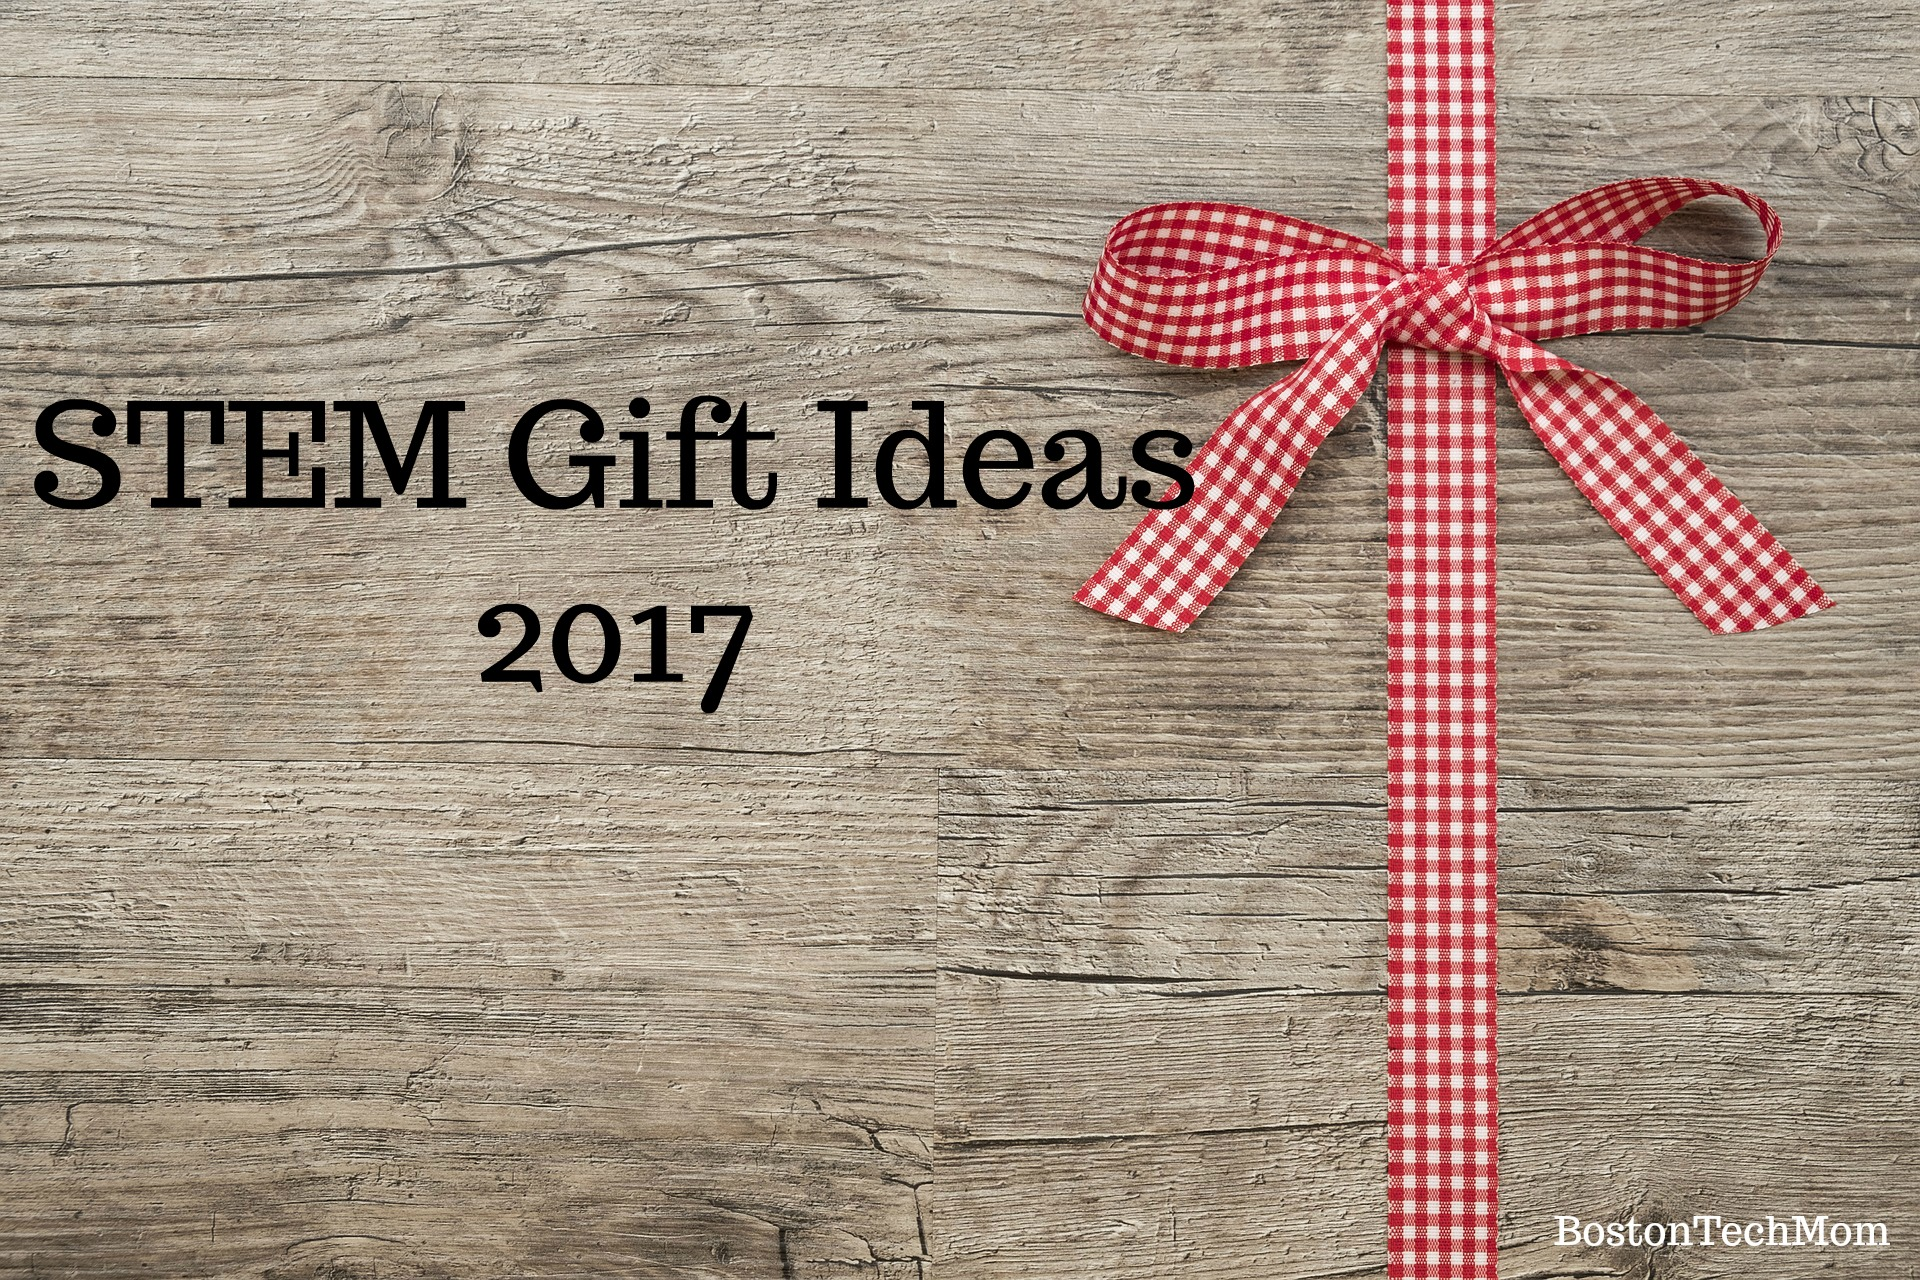 BostonTechMom s STEM Gift Ideas 2017